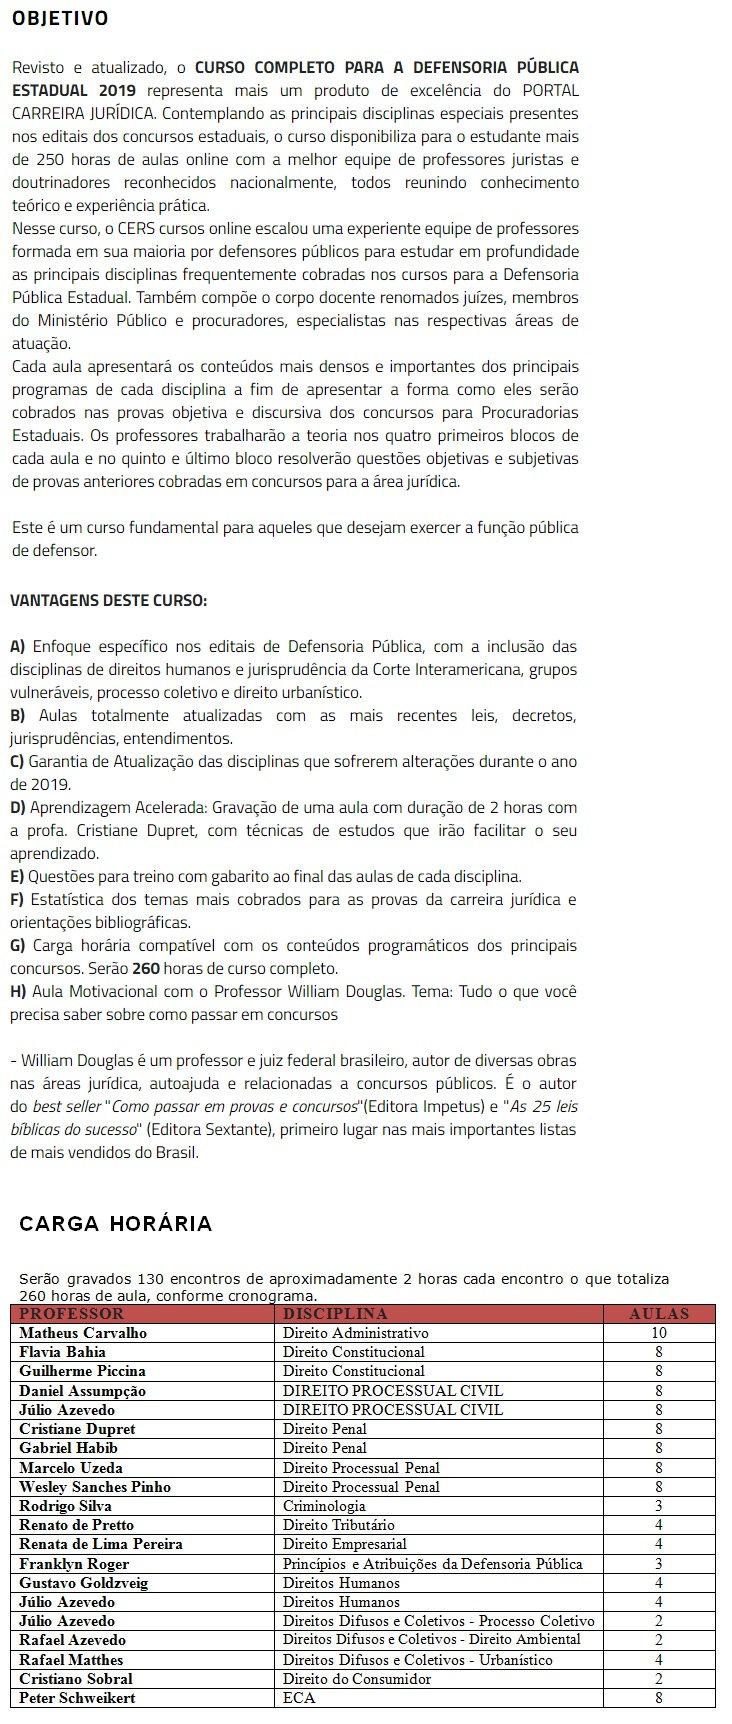 defensoria2.jpg